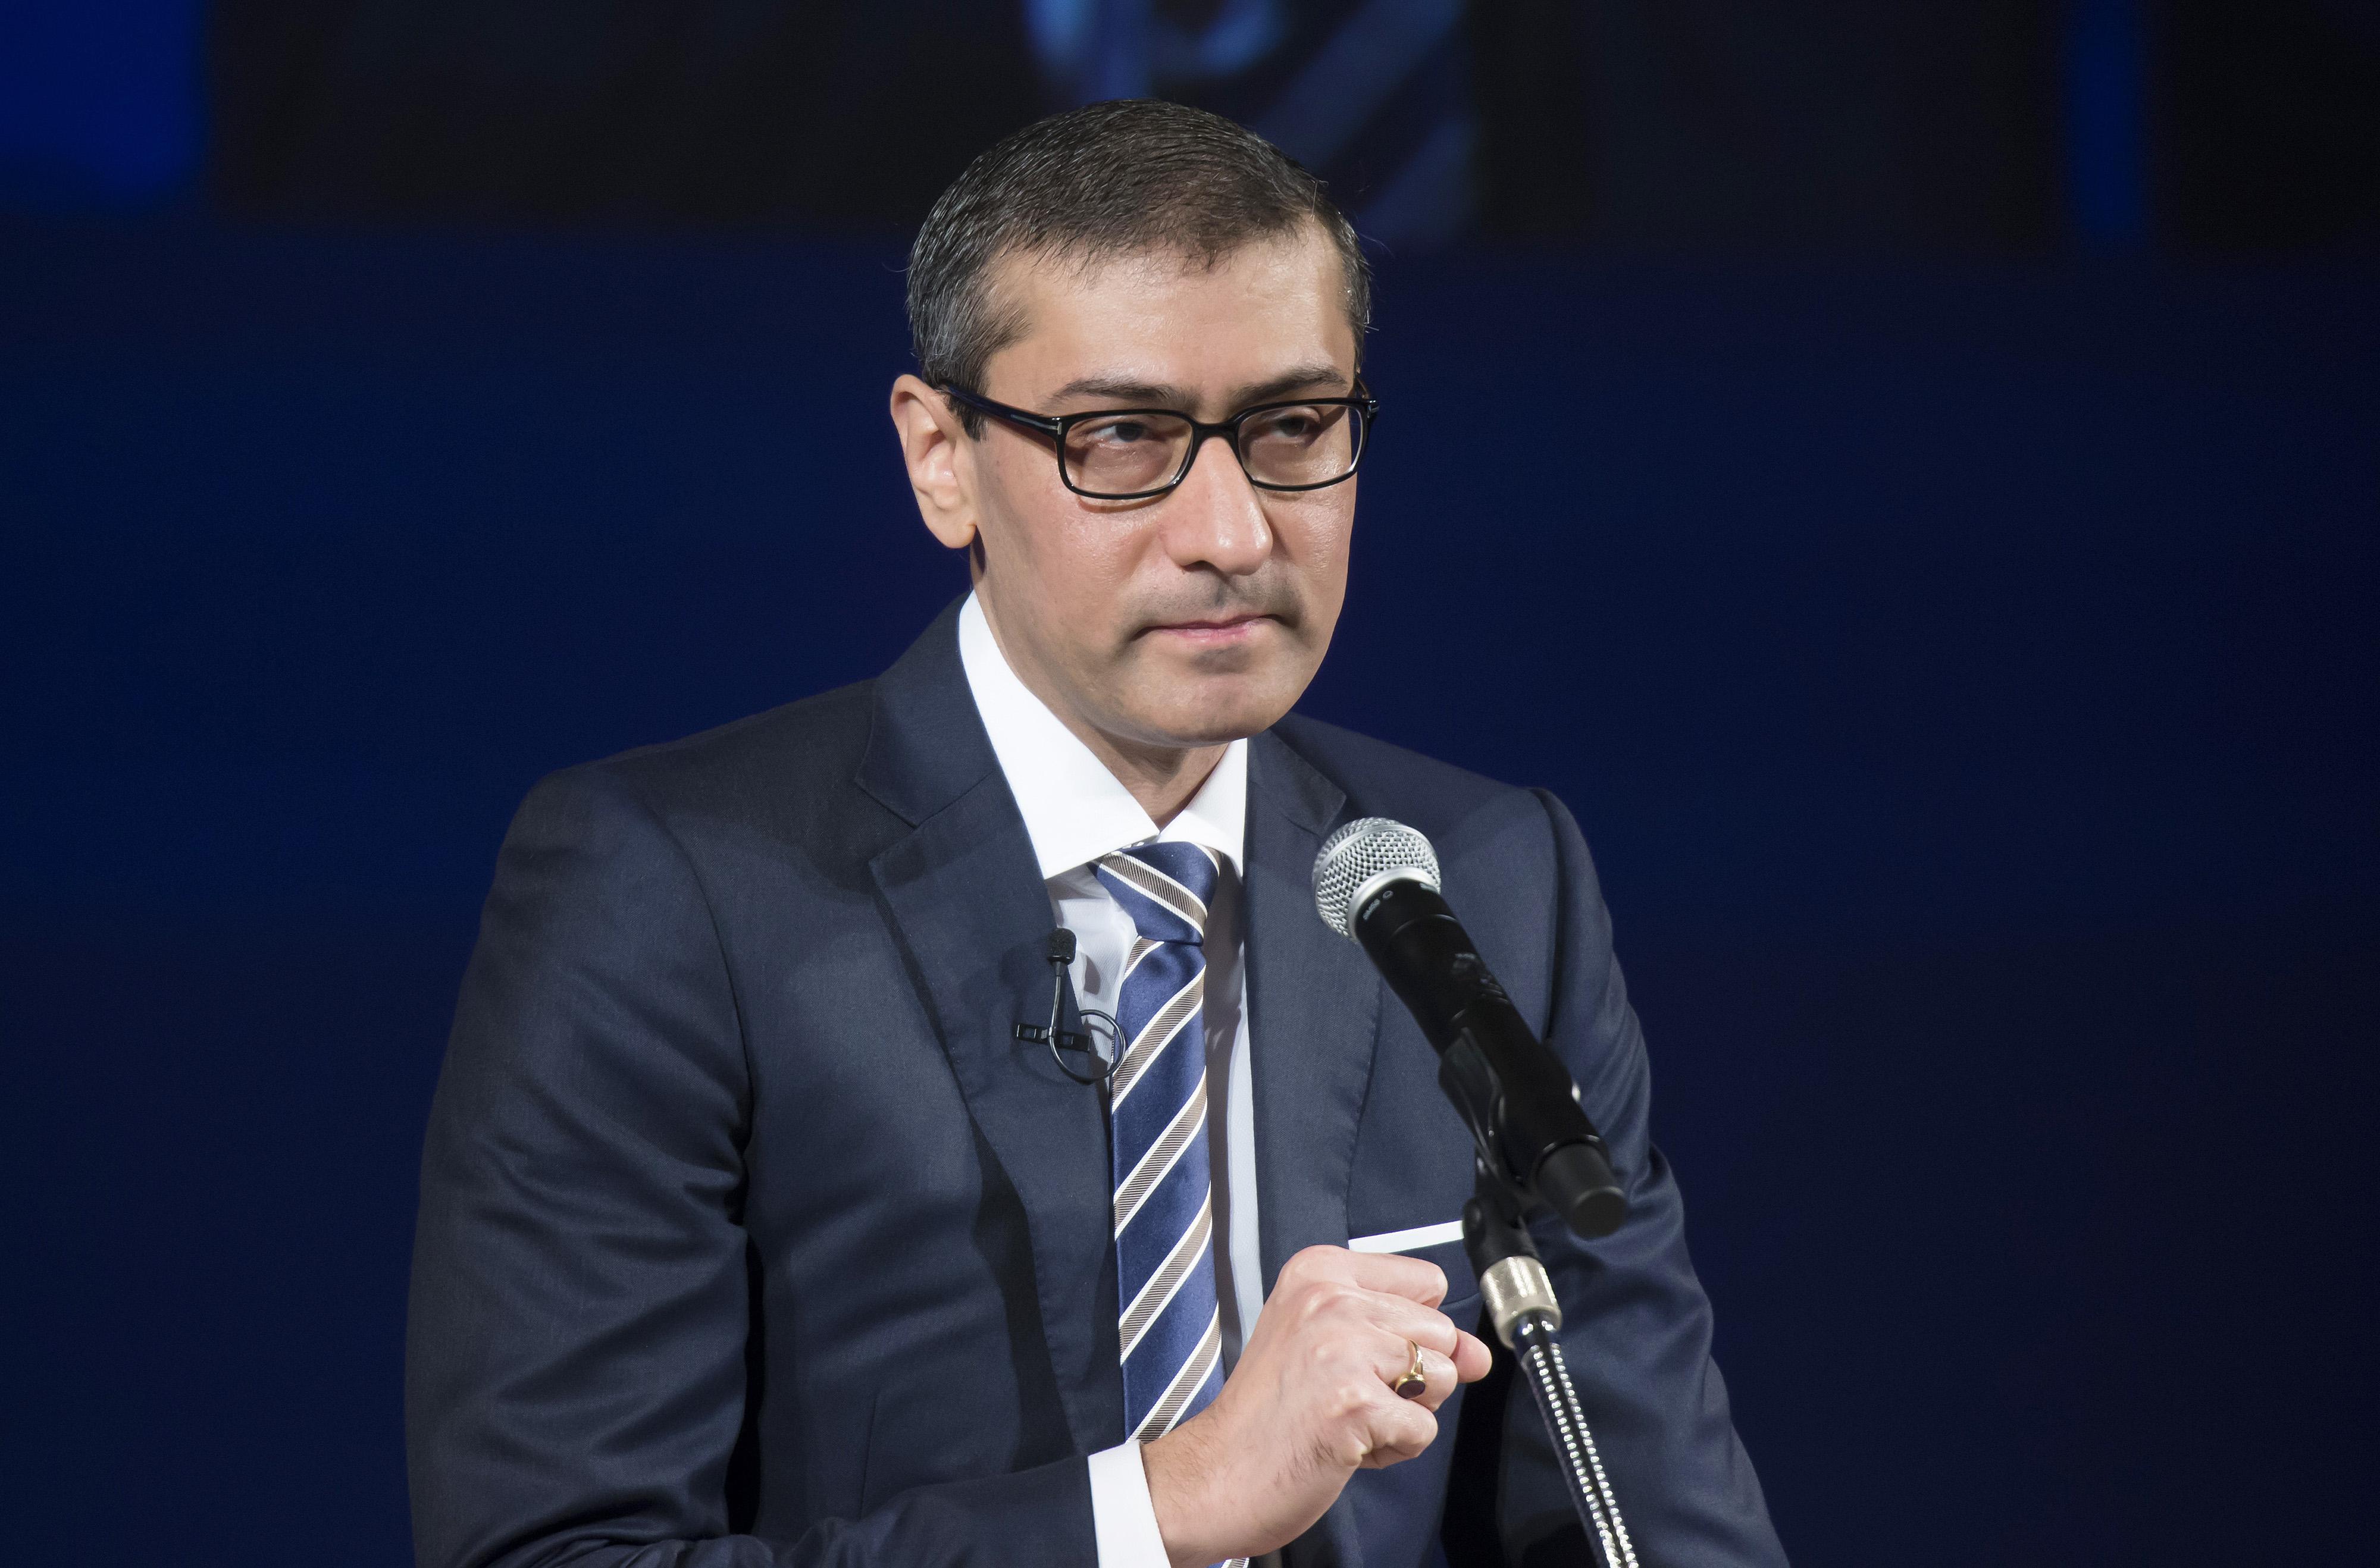 Rajeev Suri, president and chief executive officer of Nokia.